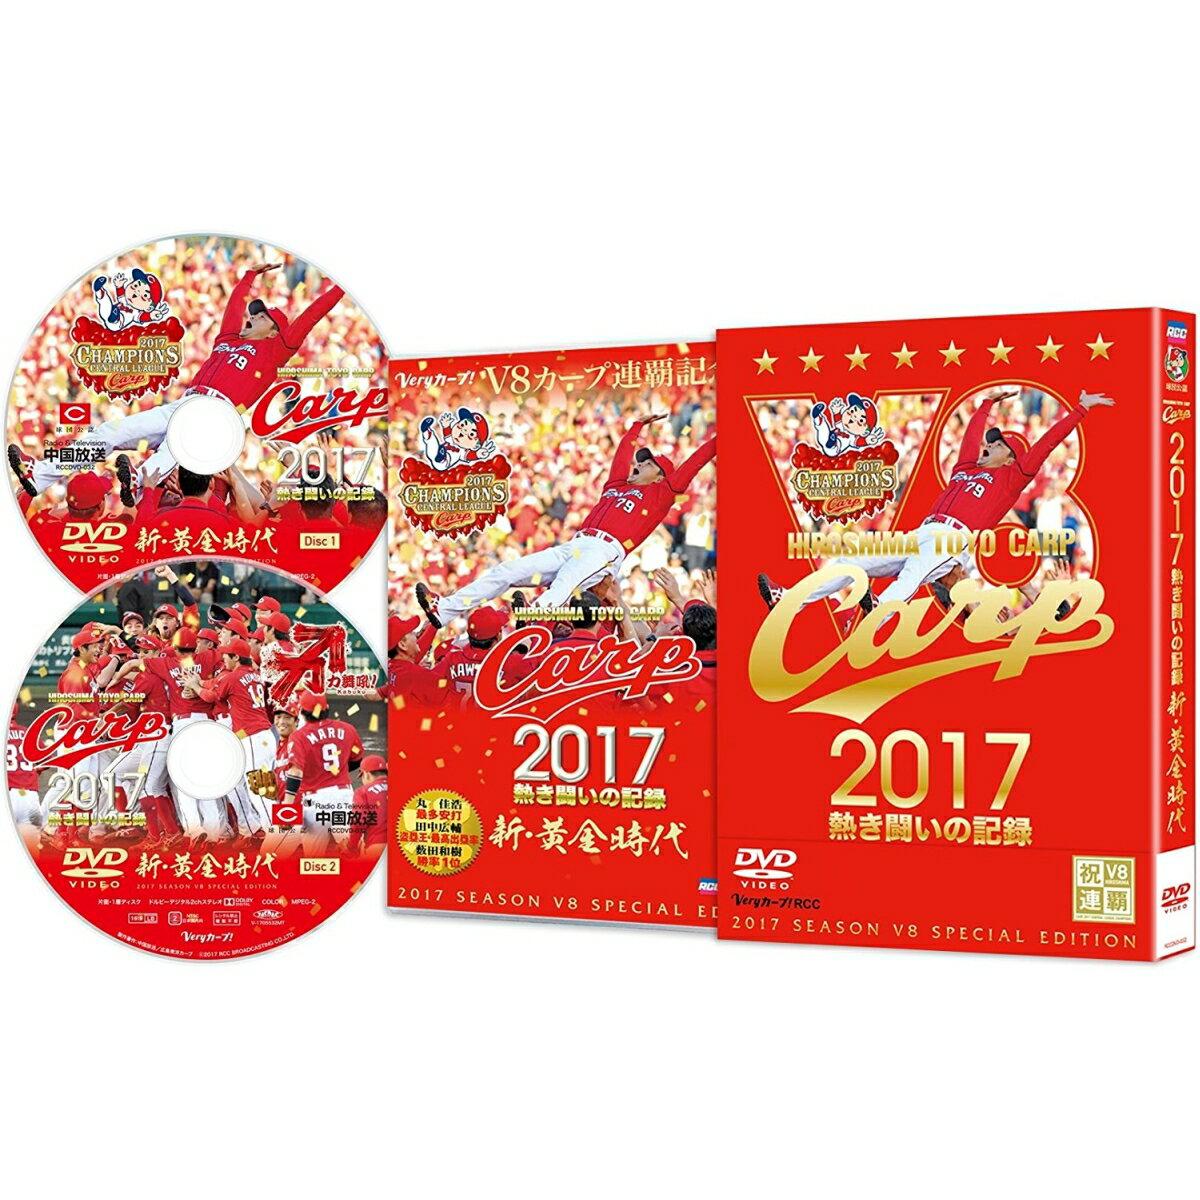 CARP2017熱き闘いの記録 V8特別記念版 〜新・黄金時代〜 [ (スポーツ) ]